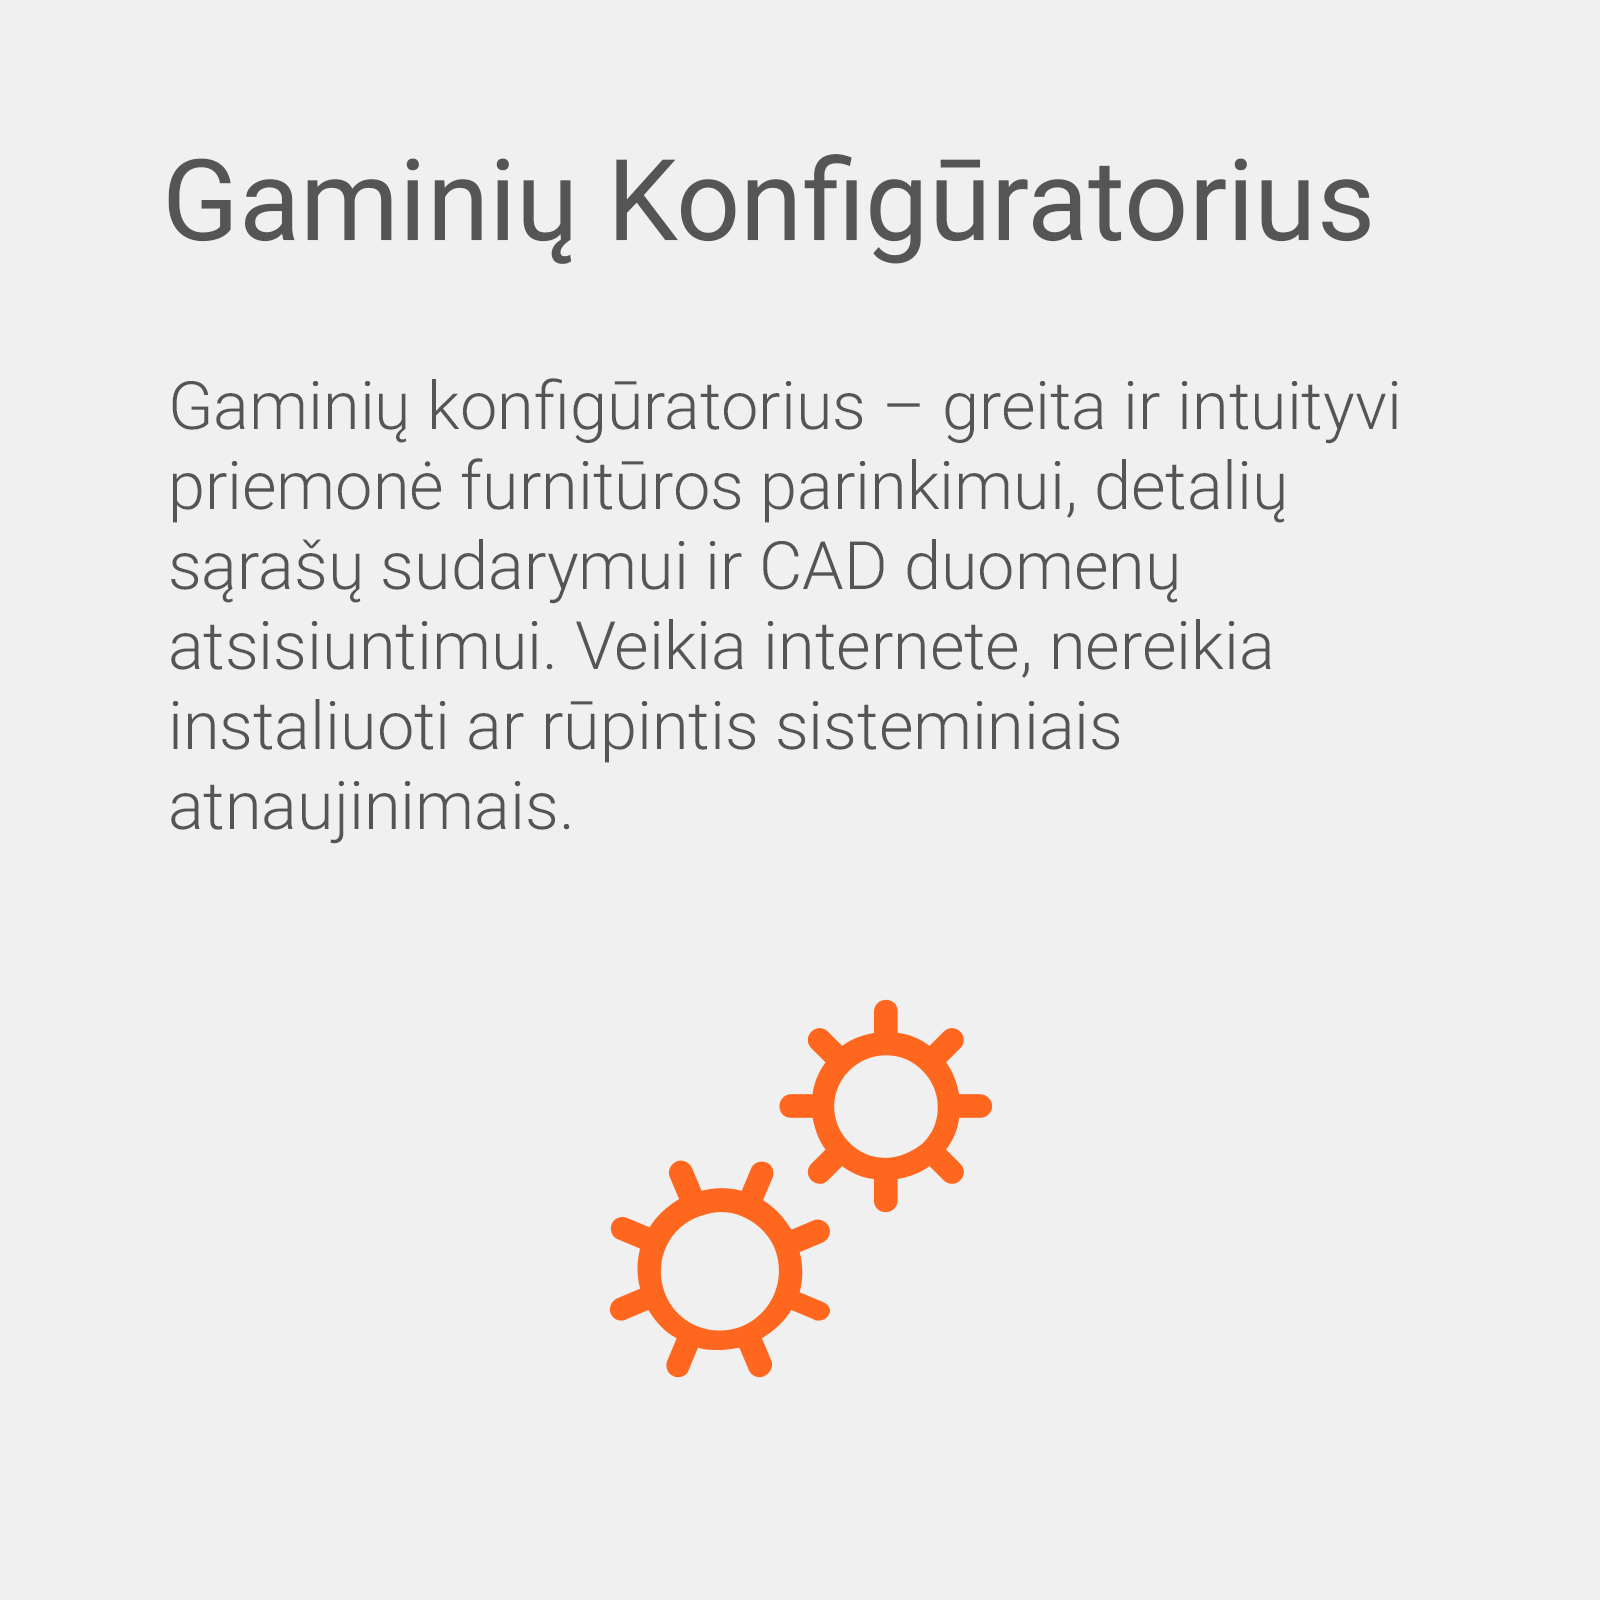 e-services_gaminiu_konfiguratorius